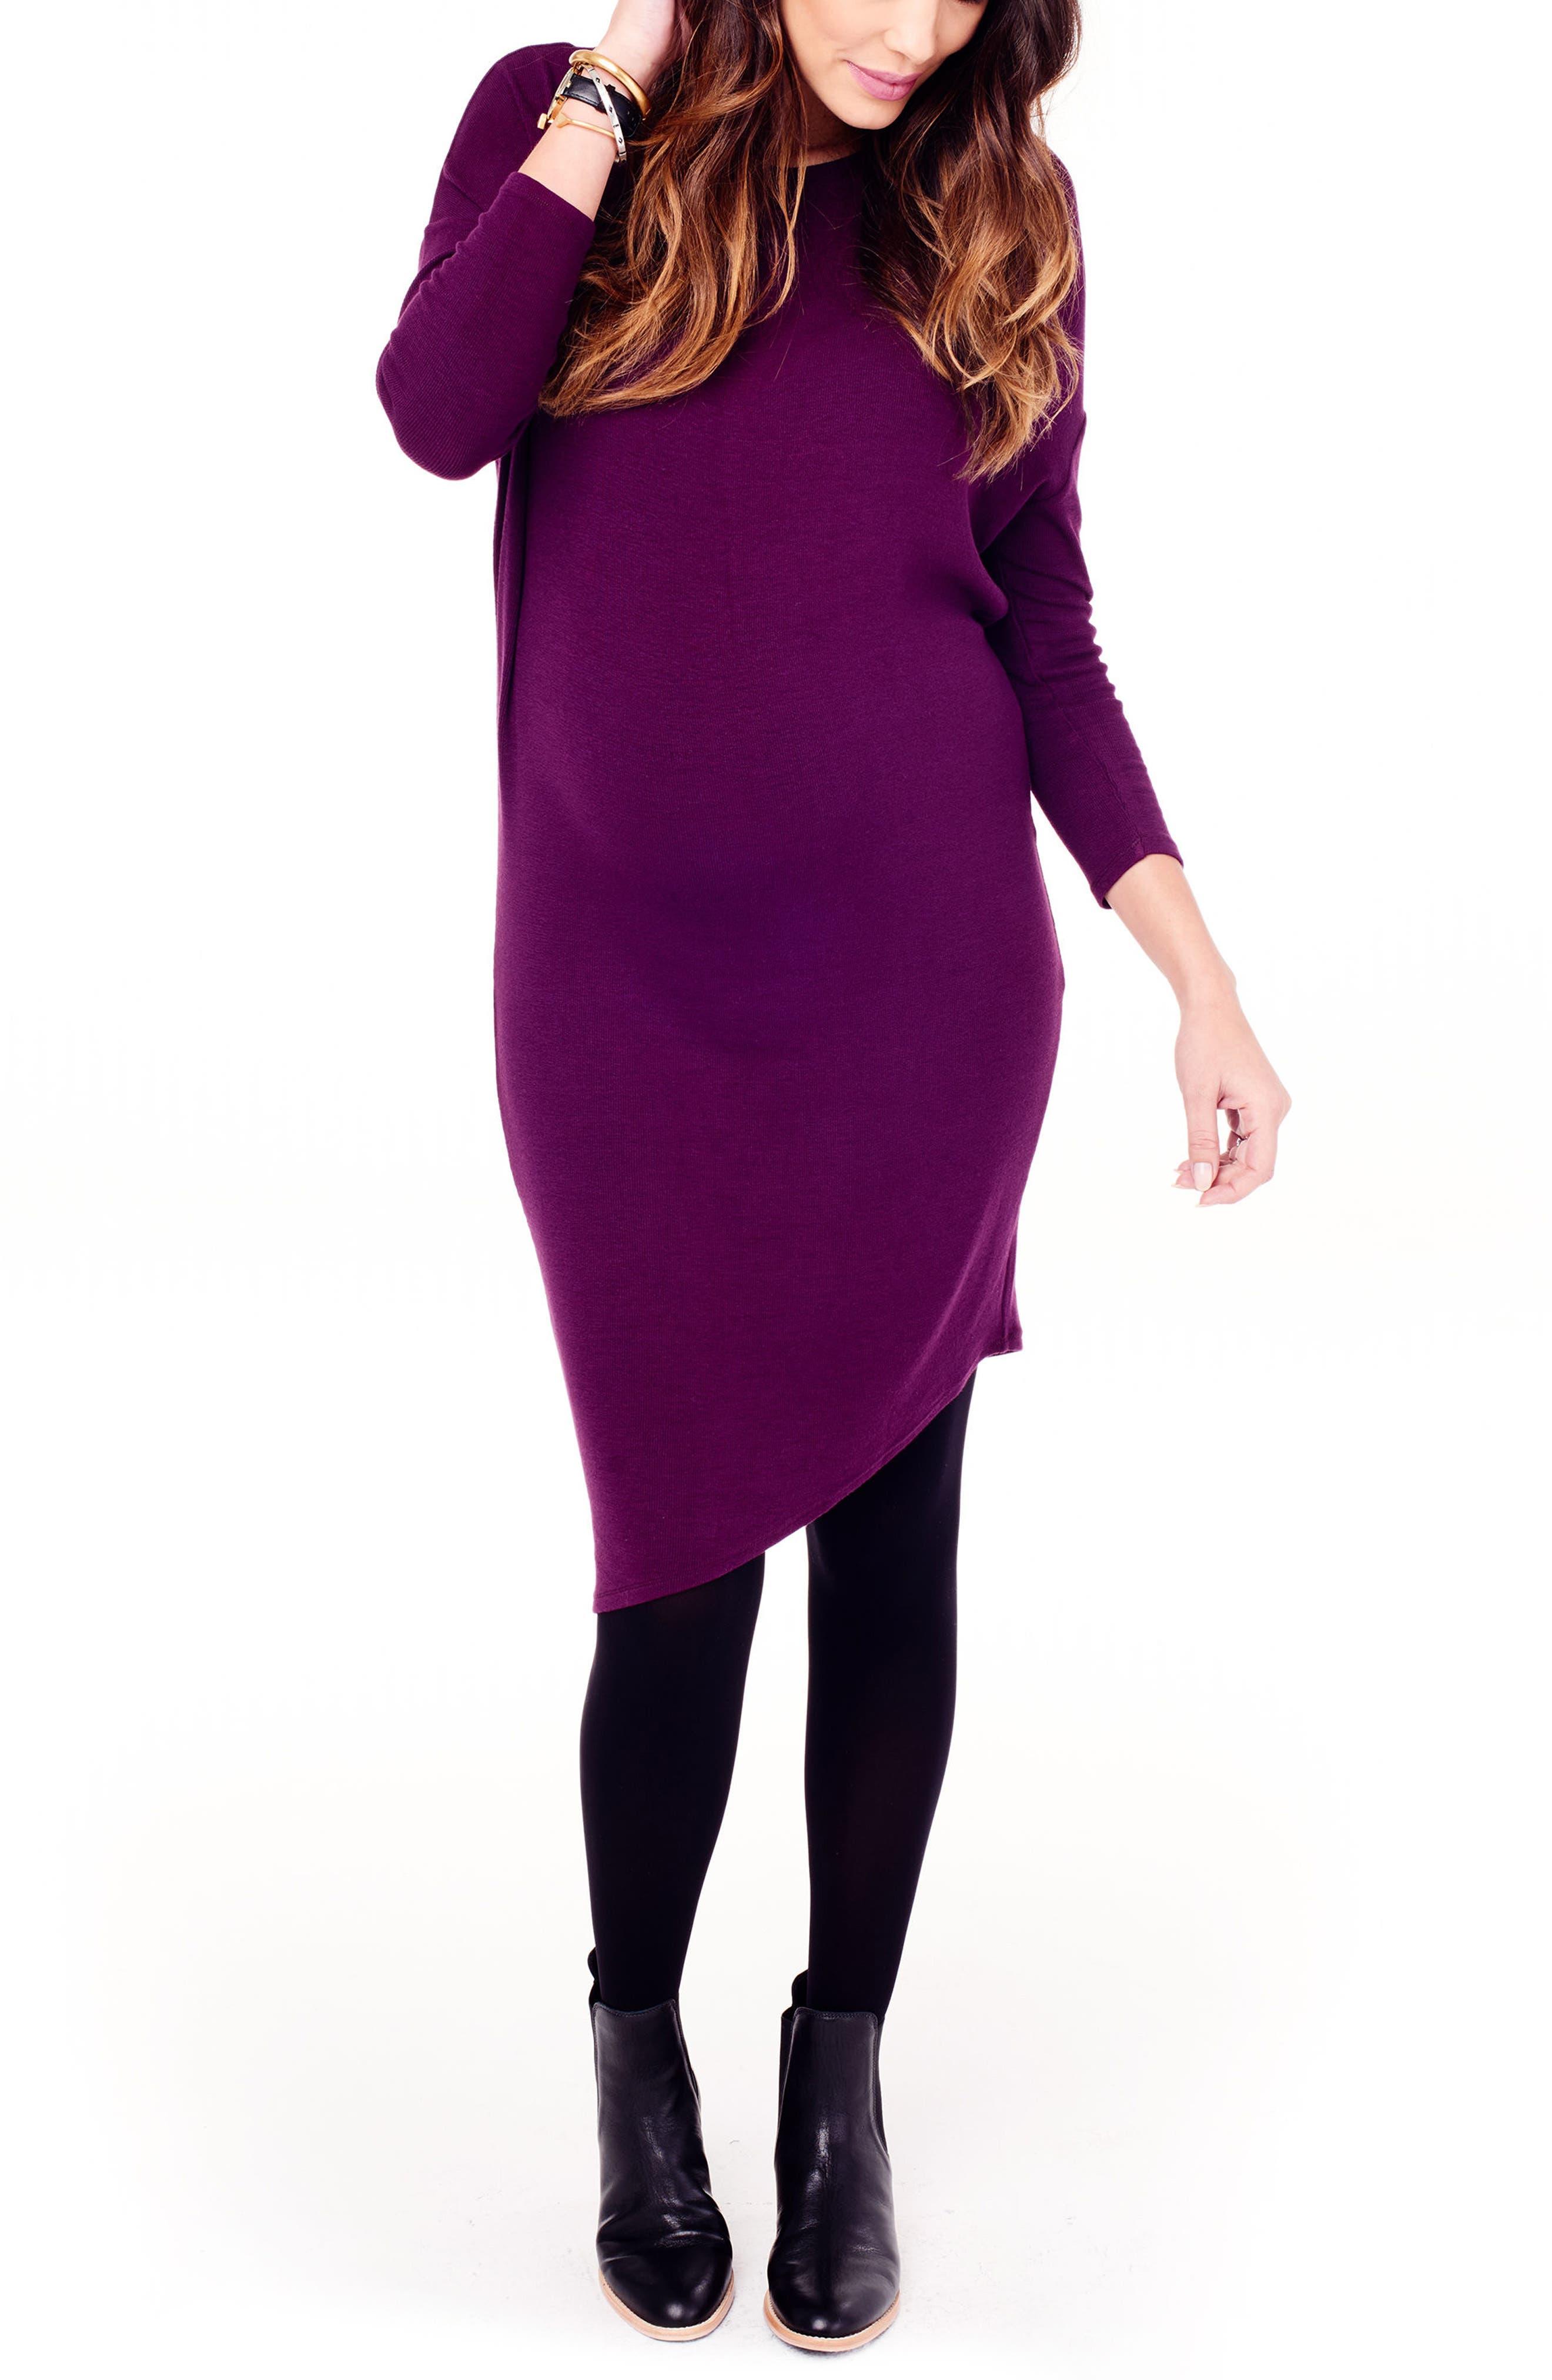 Alternate Image 1 Selected - Ingrid & Isabel® Asymmetrical Maternity Dress